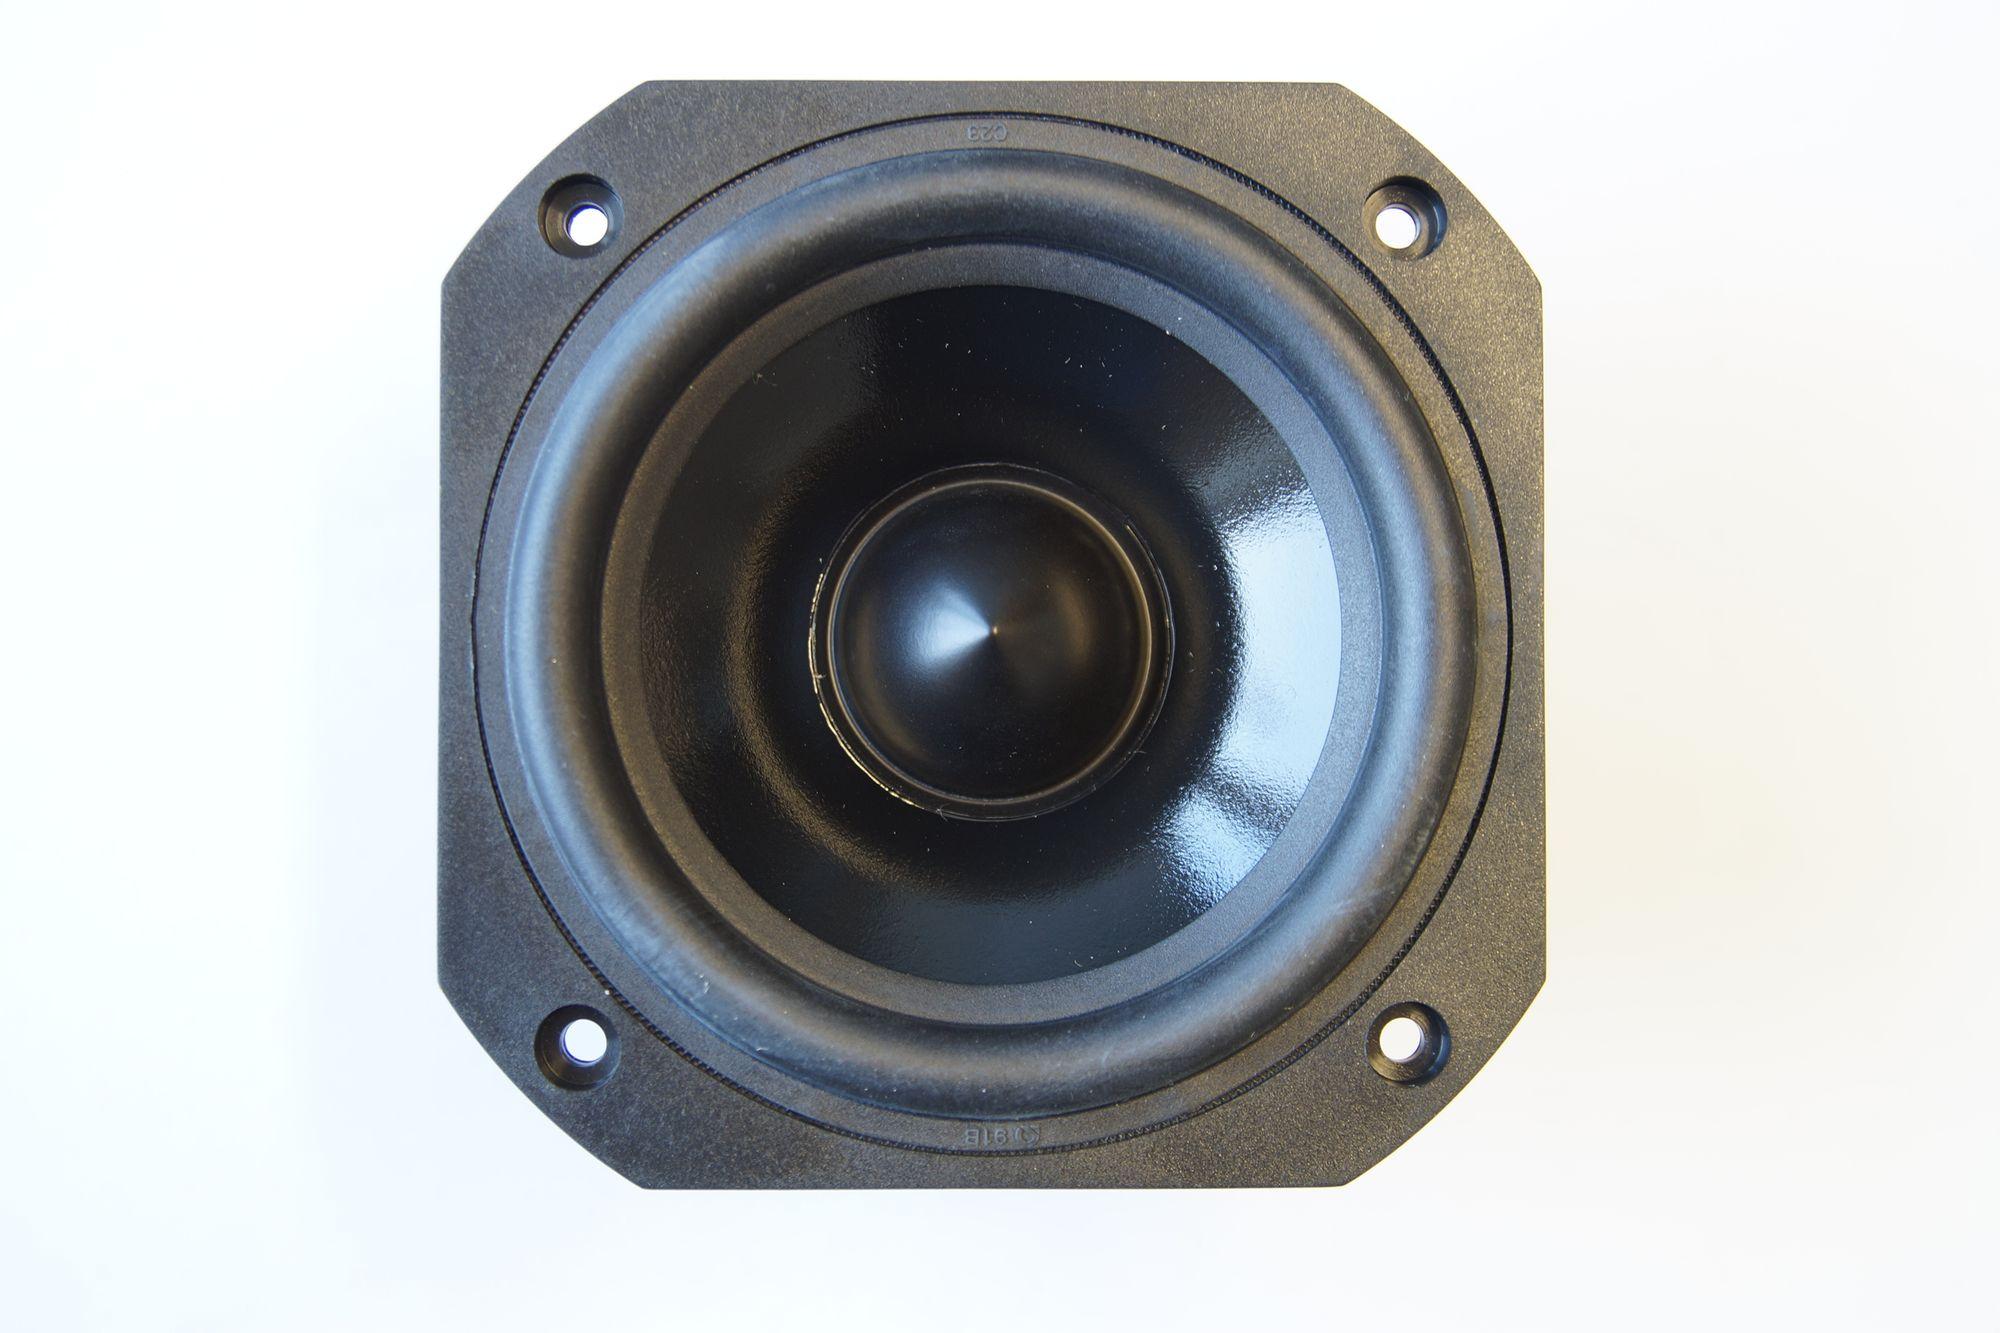 1 Stück Heco Signature Series Tiefmitteltöner HW 110 K-CPS 870 Neuware 001